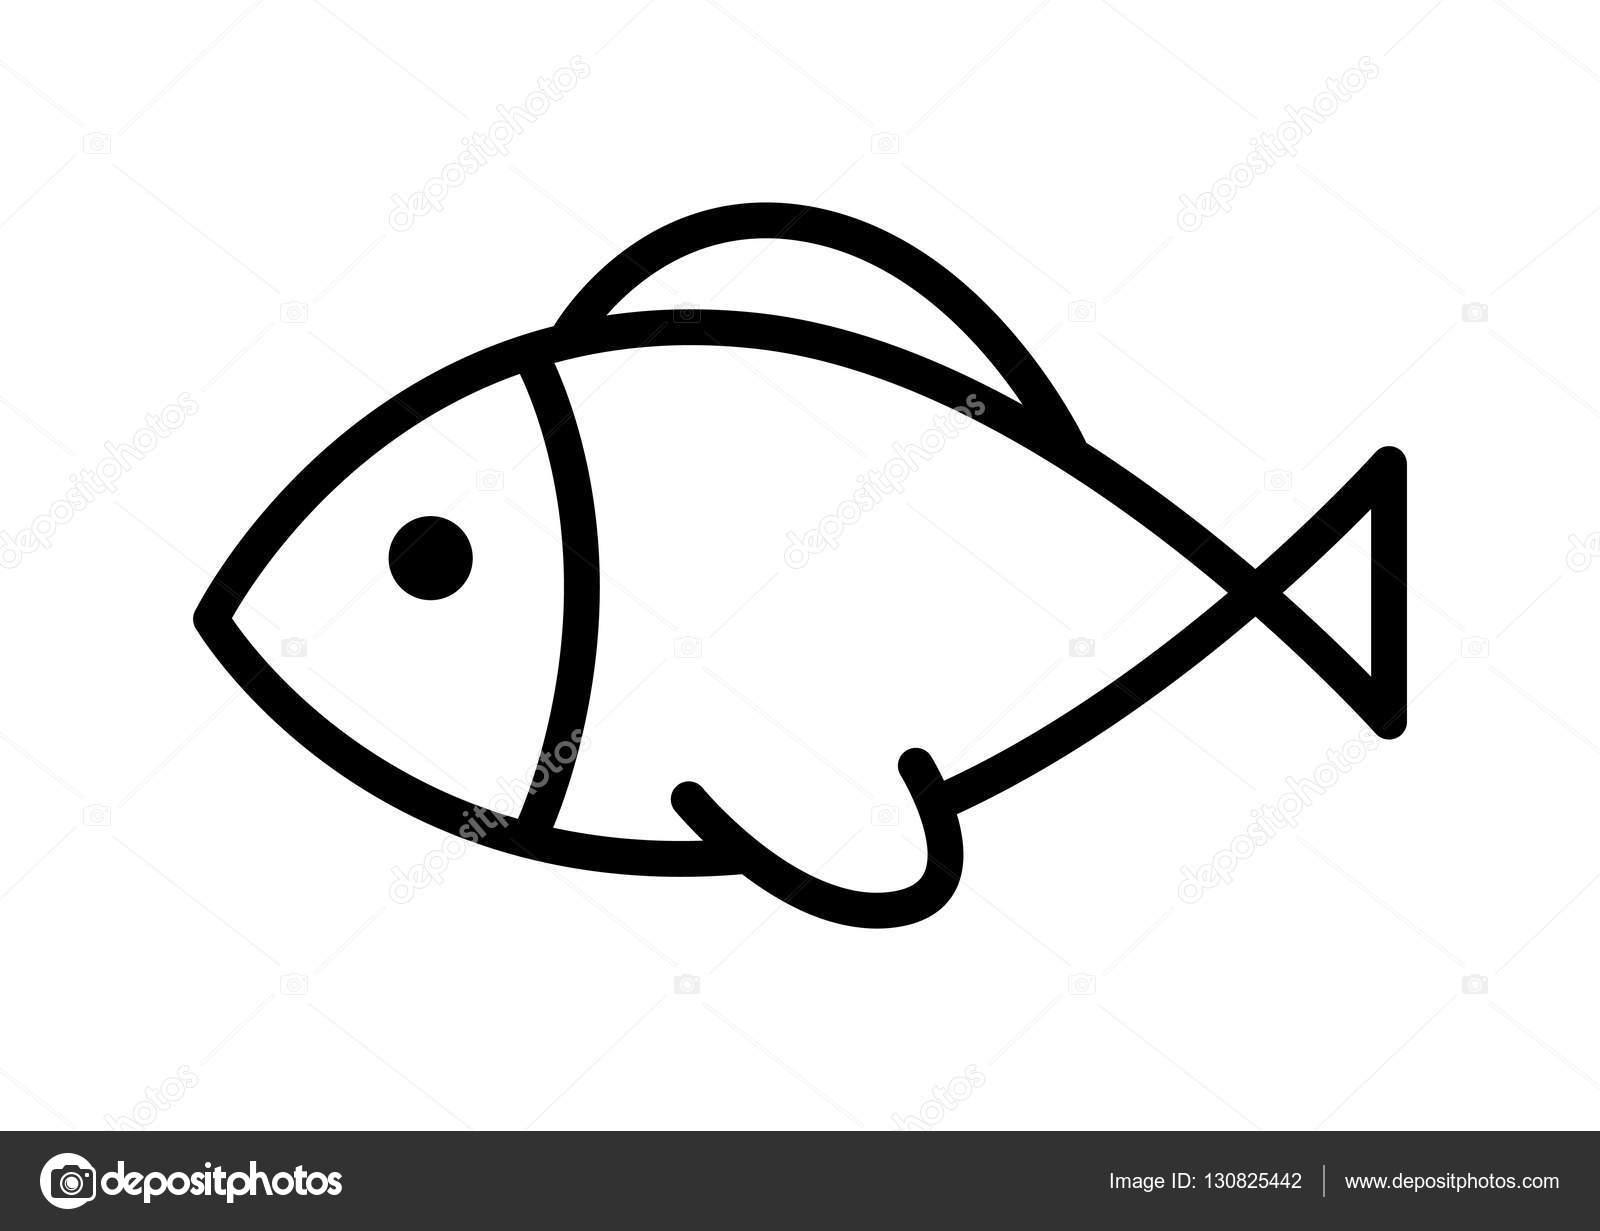 Icone De Peixe Preto Sobre Fundo Branco